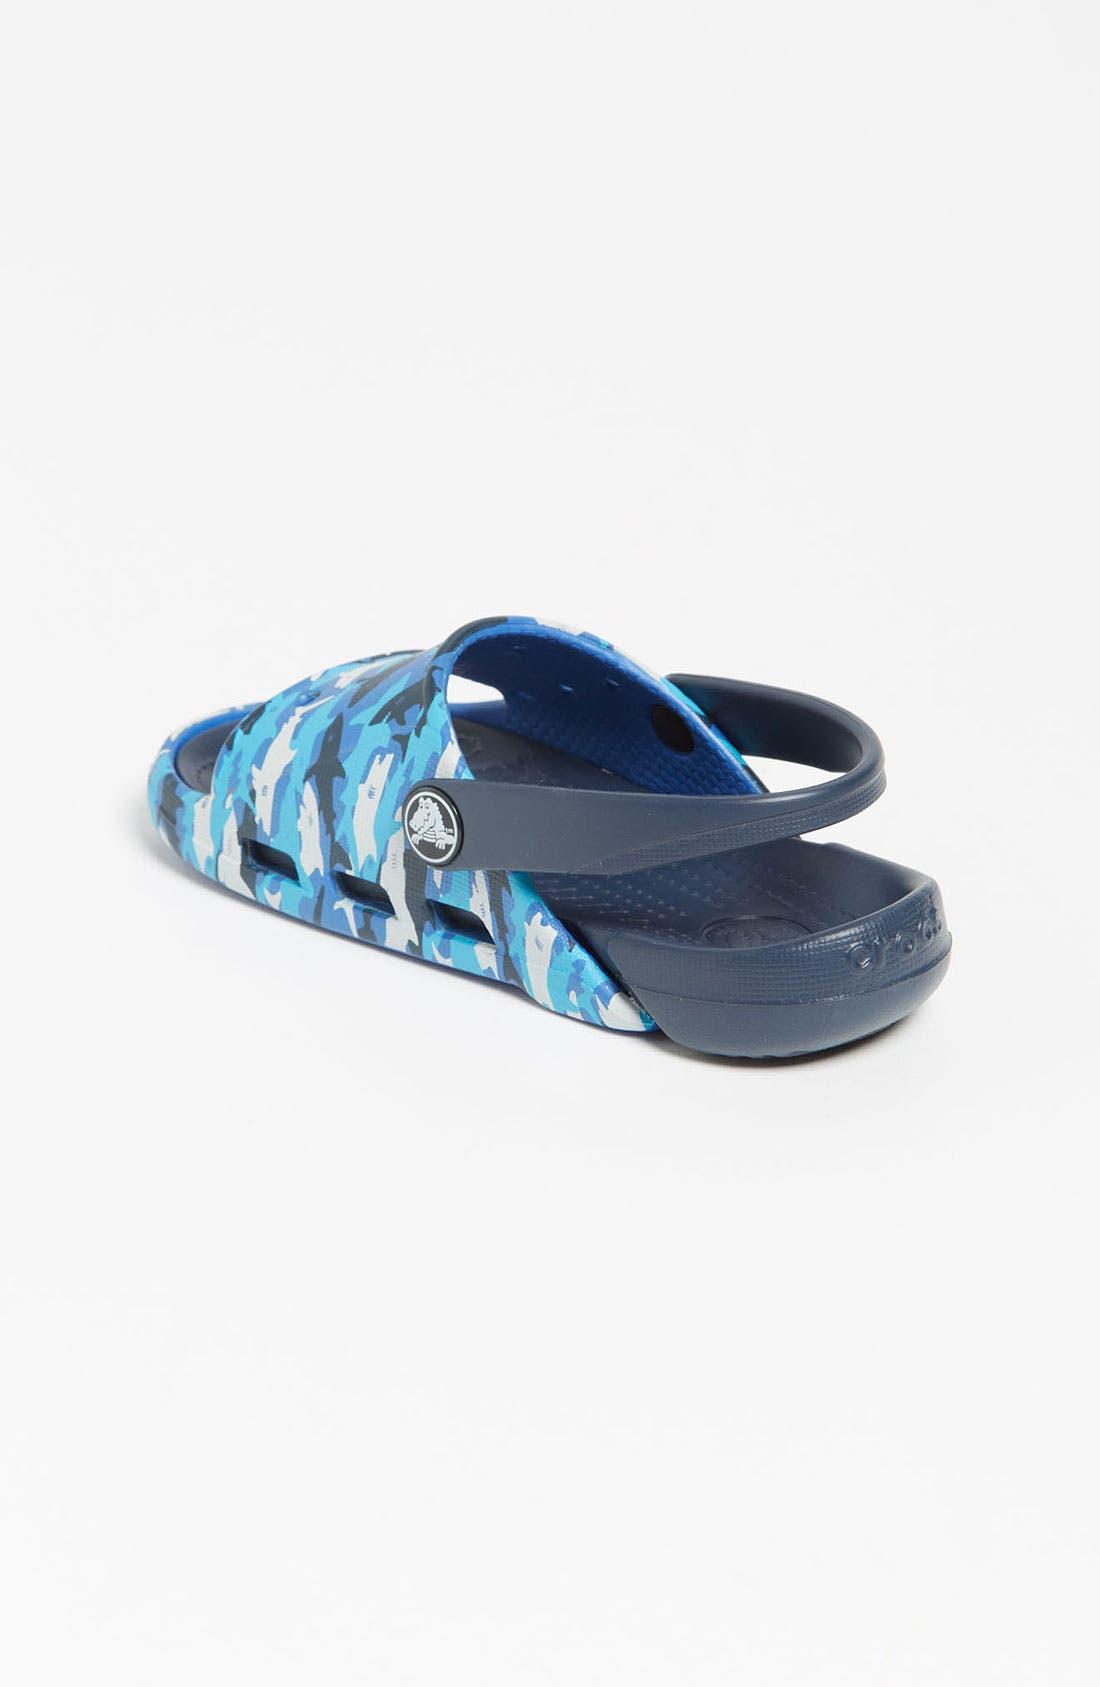 Alternate Image 2  - CROCS™ 'Electro' Sandal (Walker, Toddler & Little Kid)